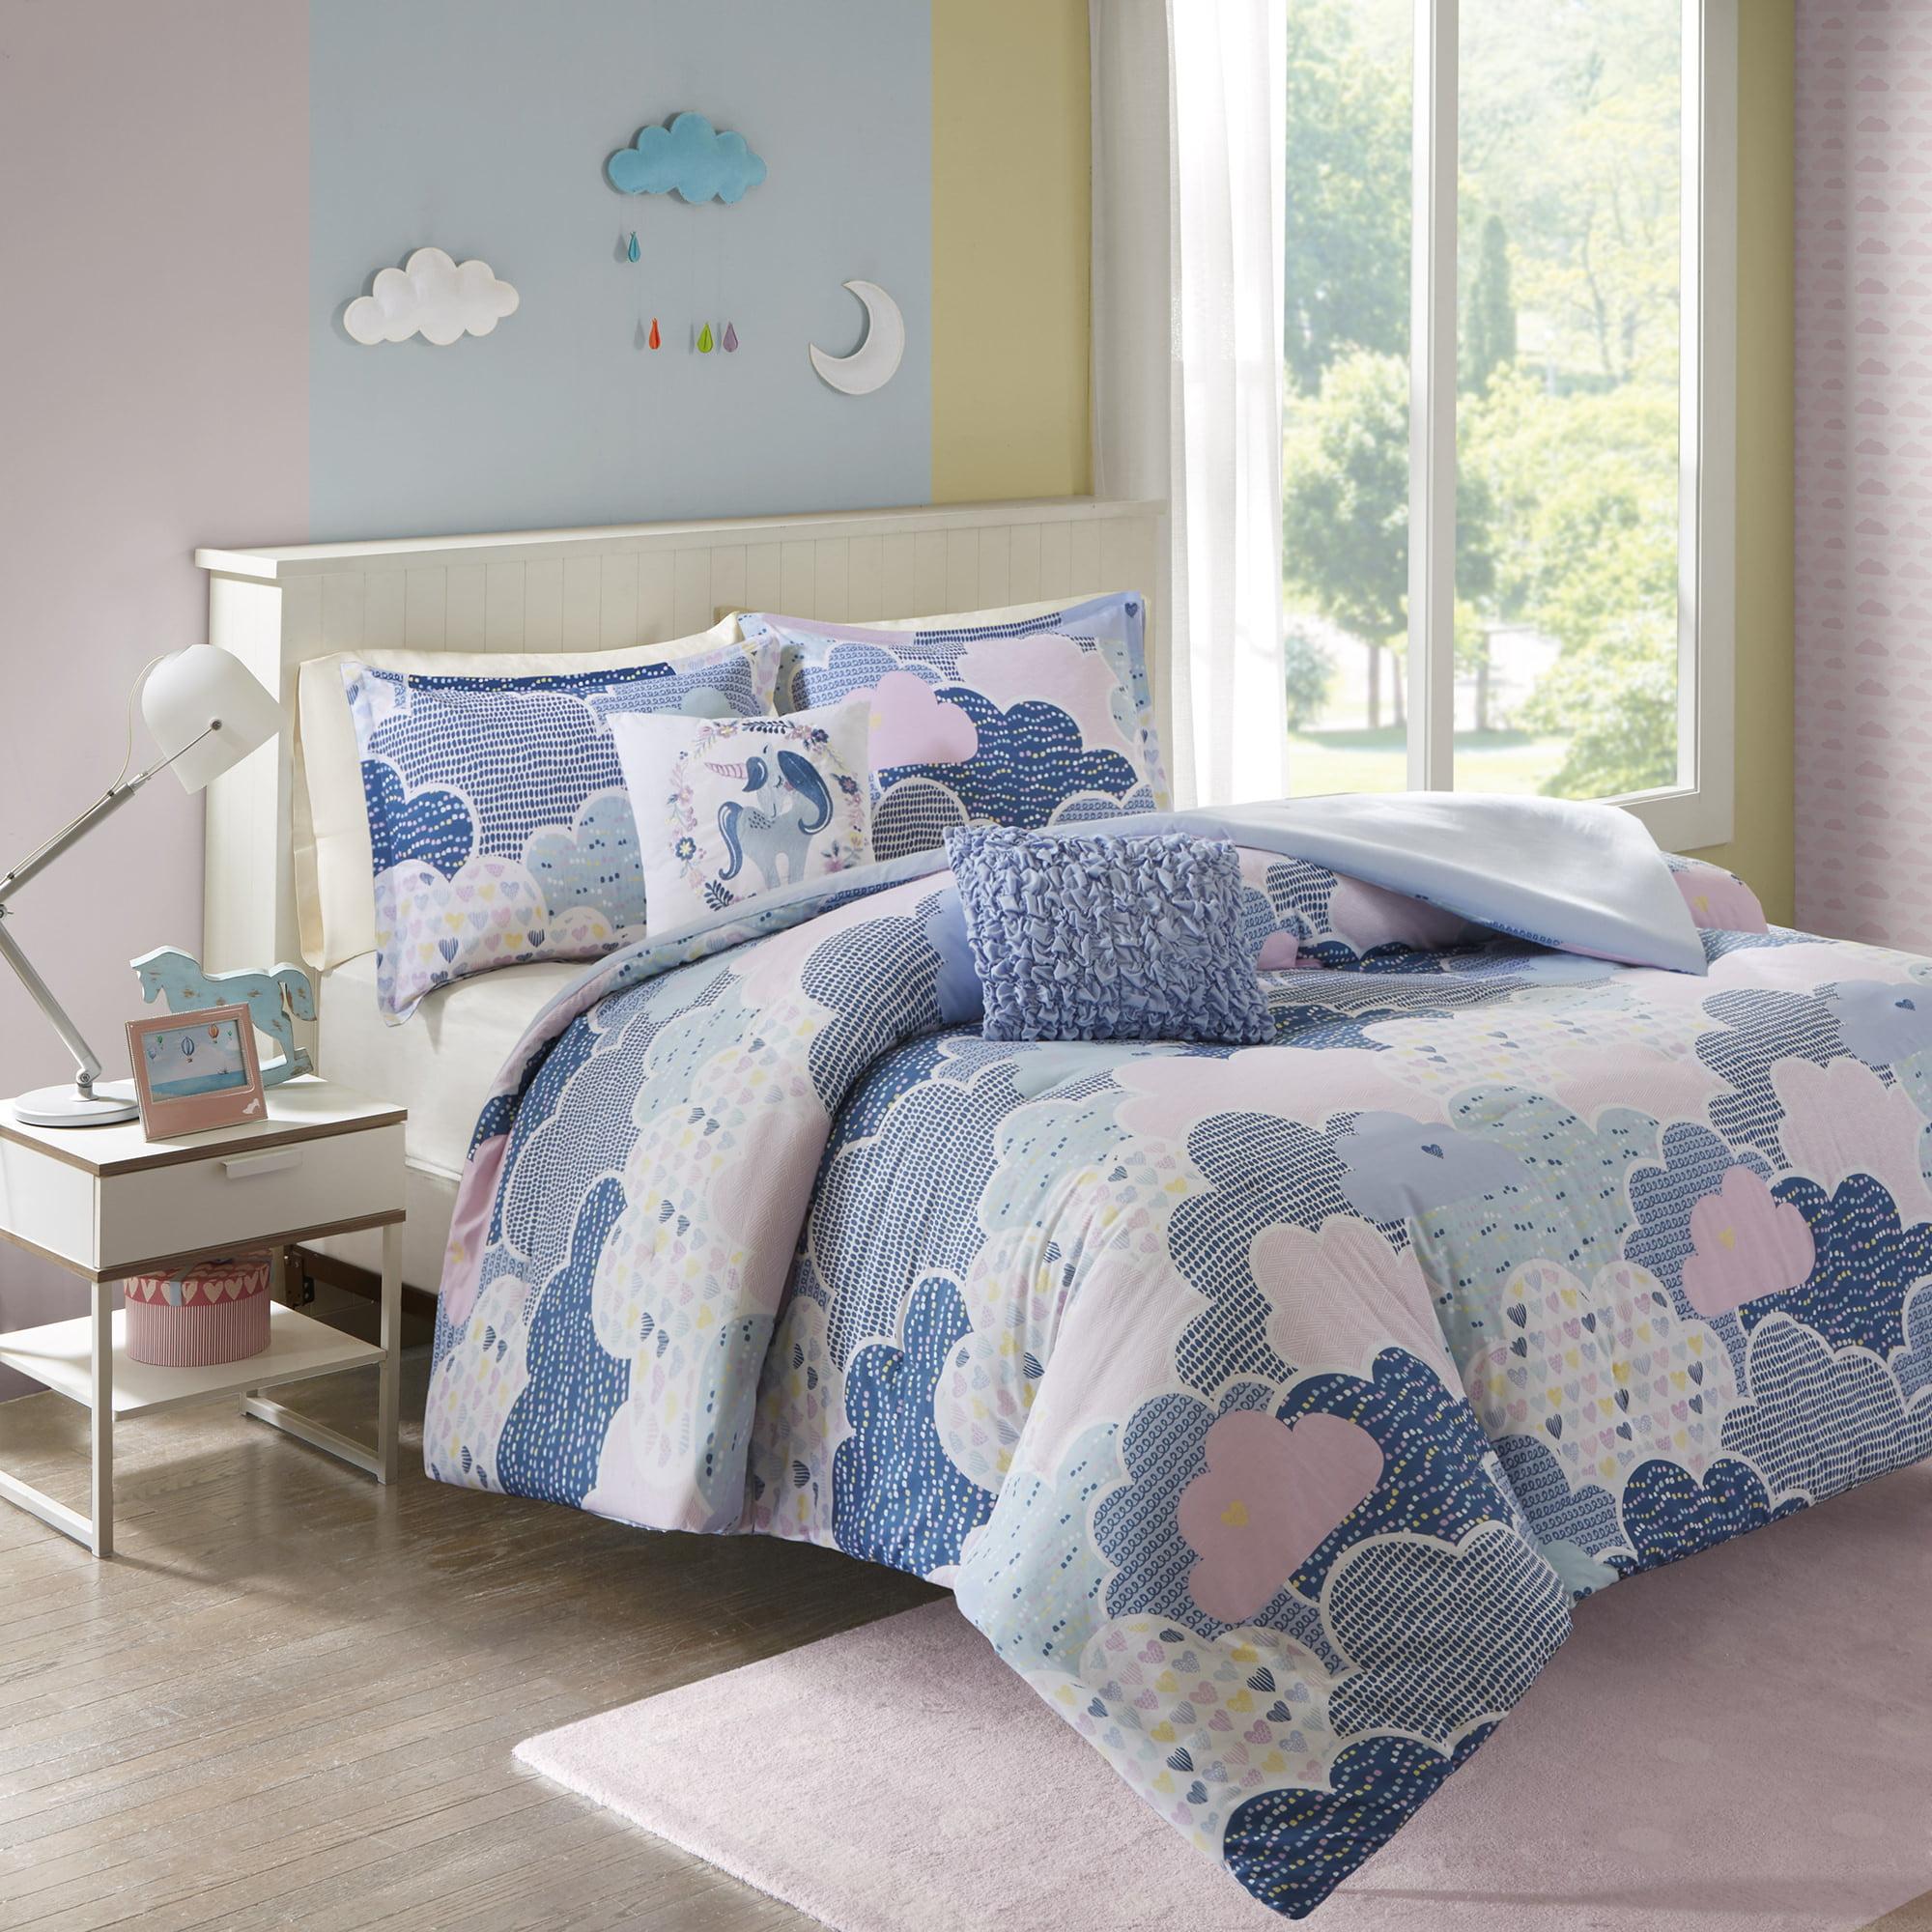 Home Essence Kids Euphoria Cloud Printed Cotton Duvet Cover Set